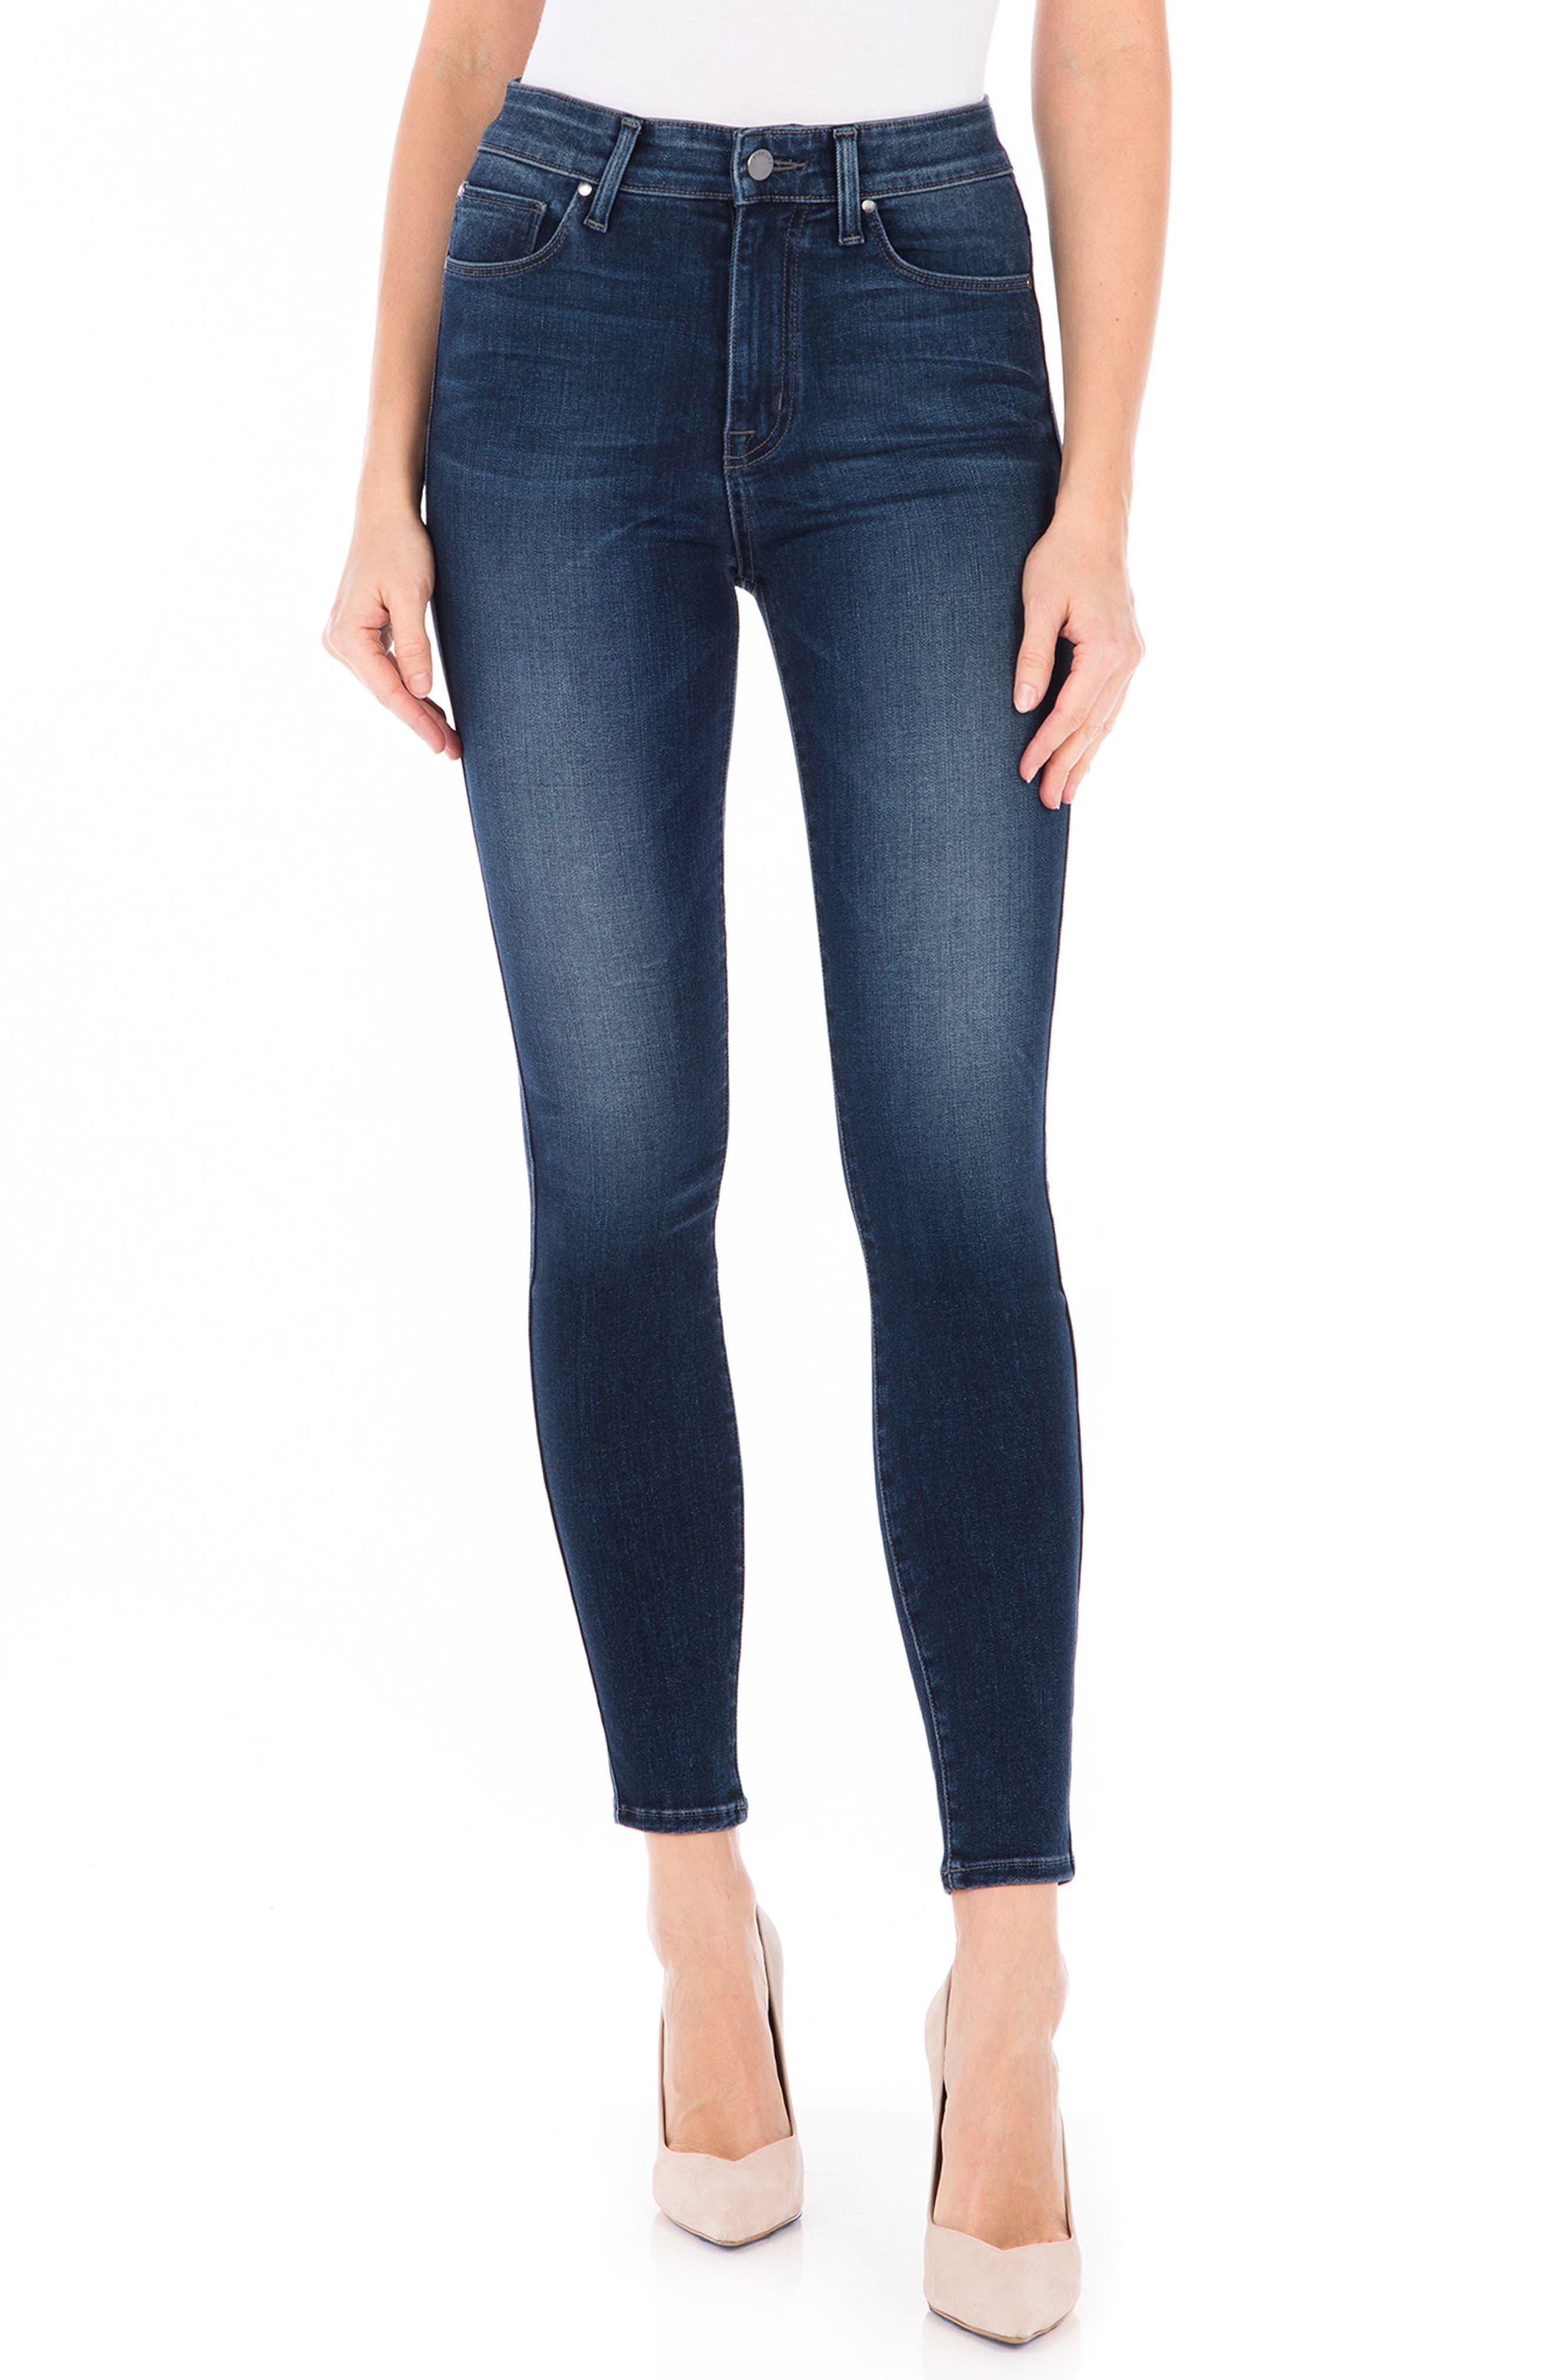 Luna High Waist Skinny Jeans,                             Main thumbnail 1, color,                             Blue Suede